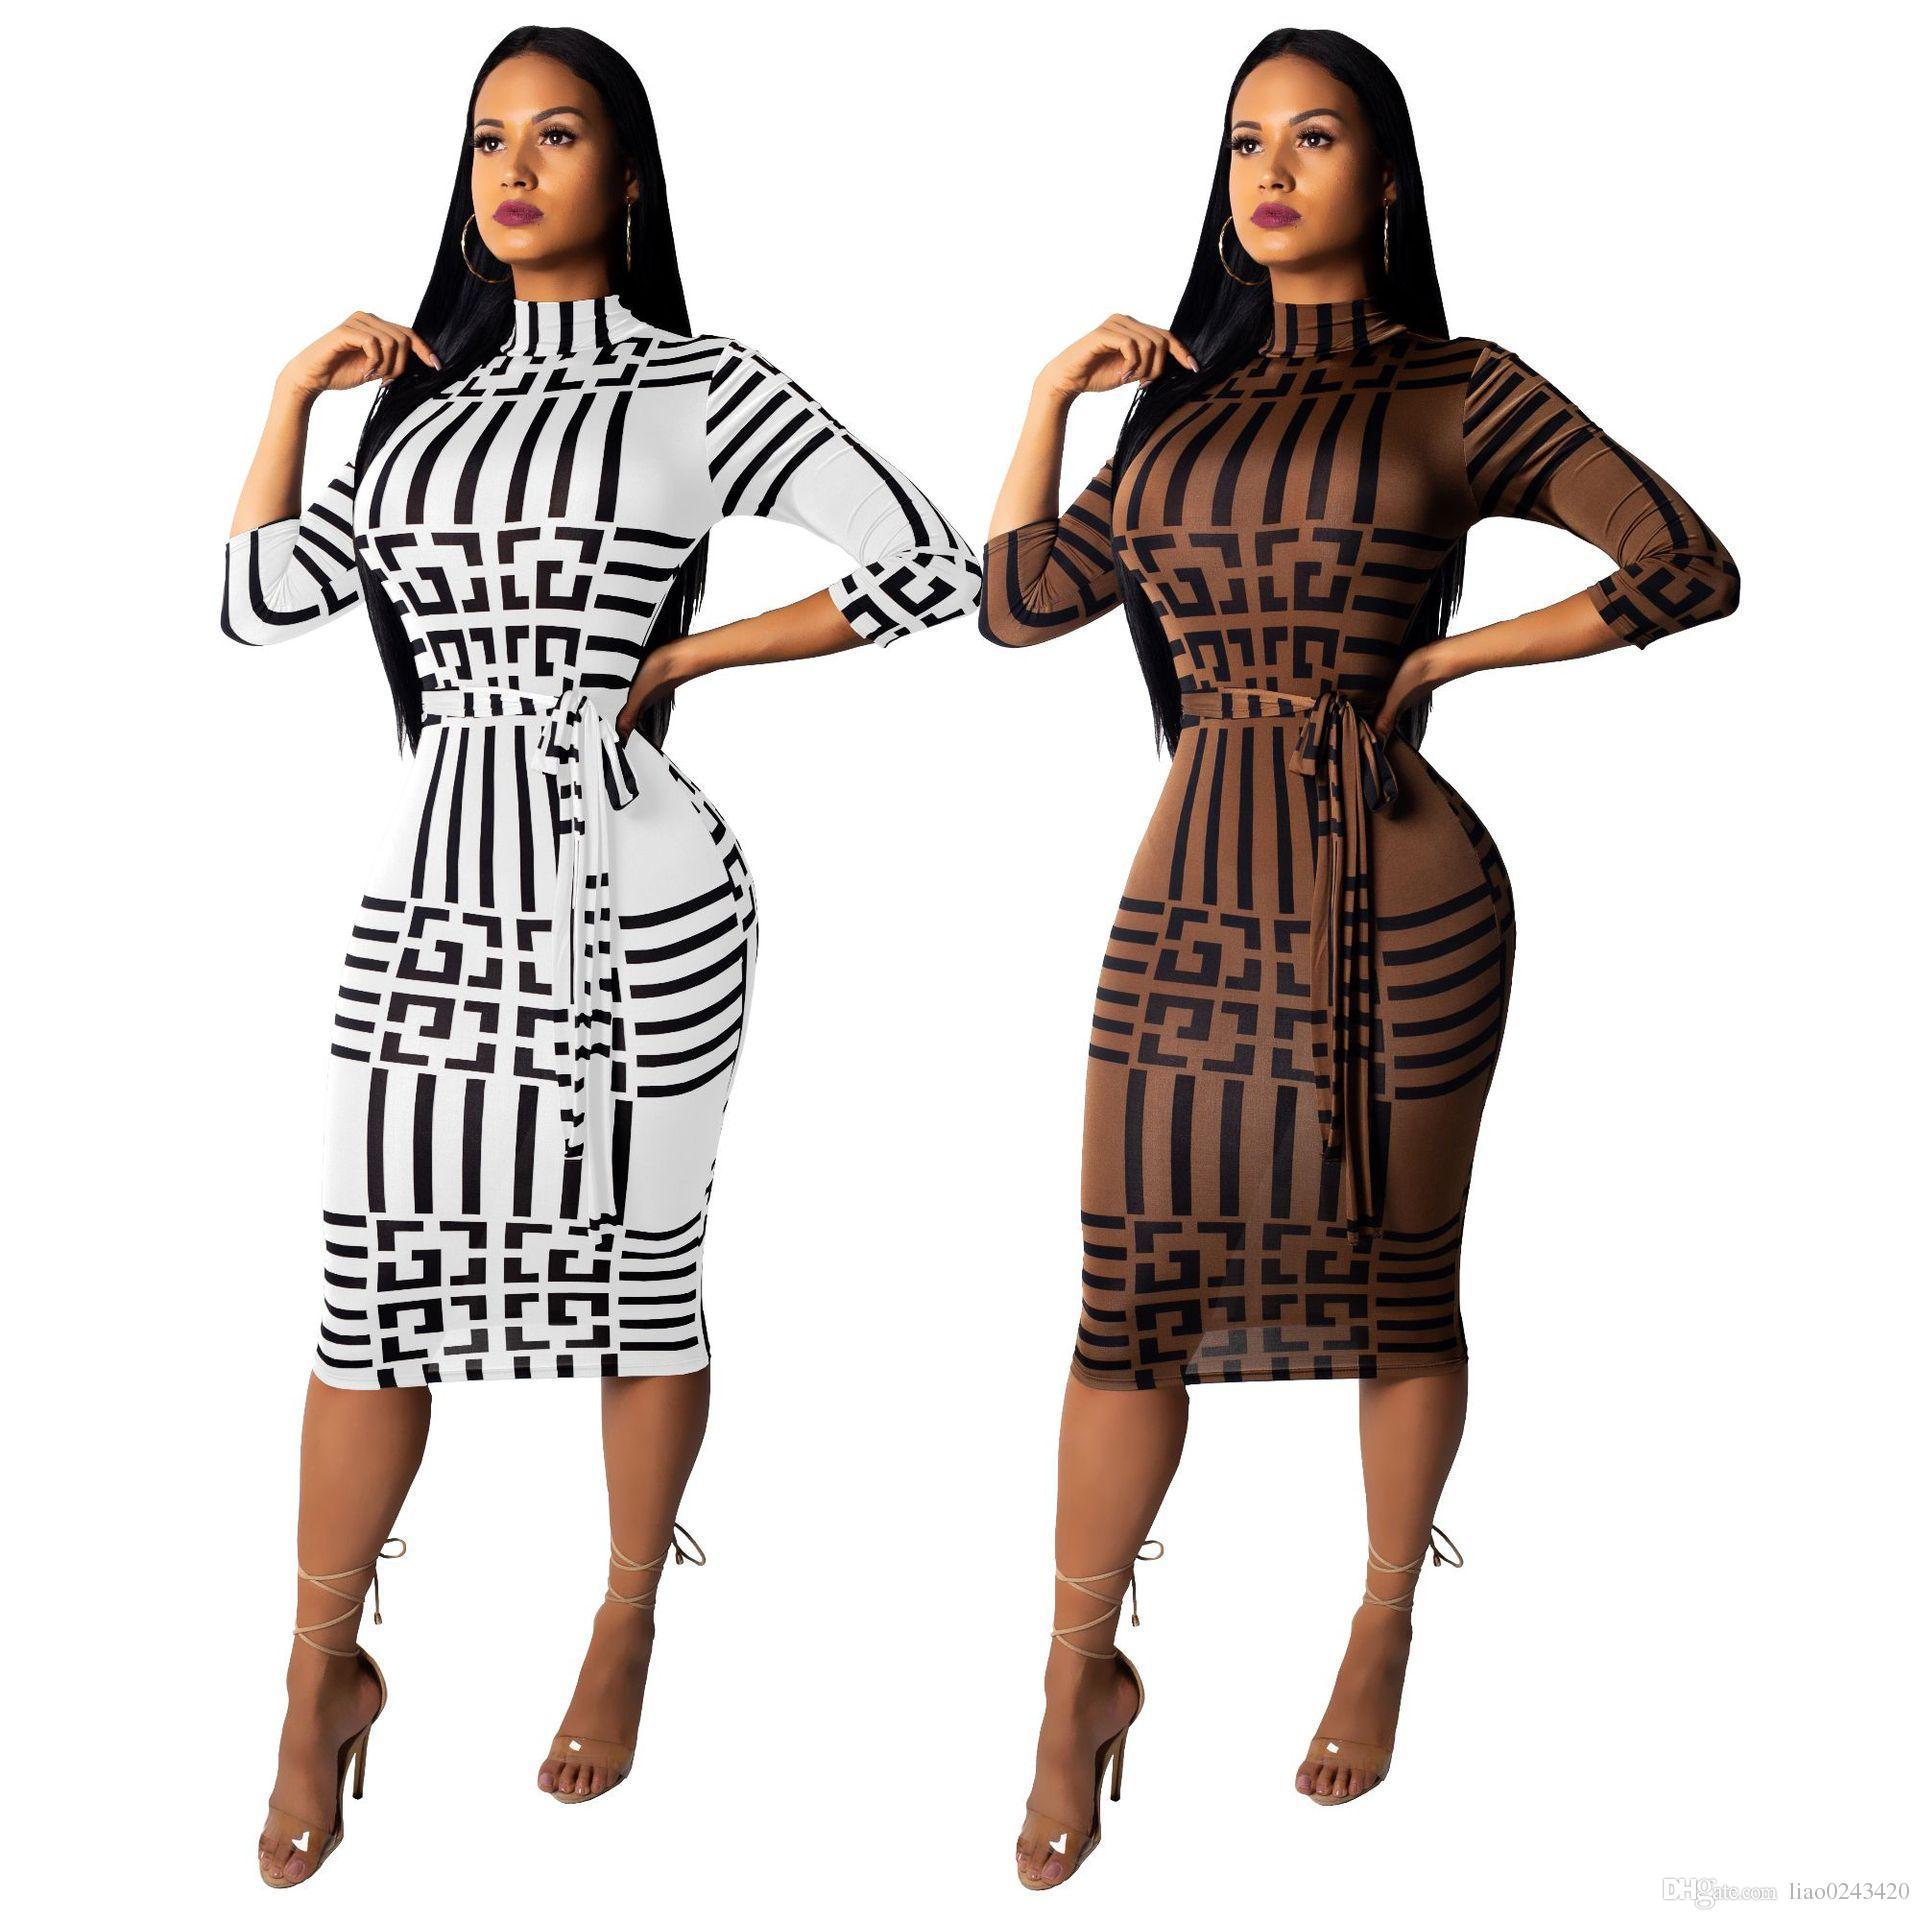 f3a428a581 2019 Free Ship Women Fashion Crew Neck Slim Fit Pencil Dress High Waist  Bodycon Midi Dress Long Sleeve From Liao0243420, $16.09 | DHgate.Com